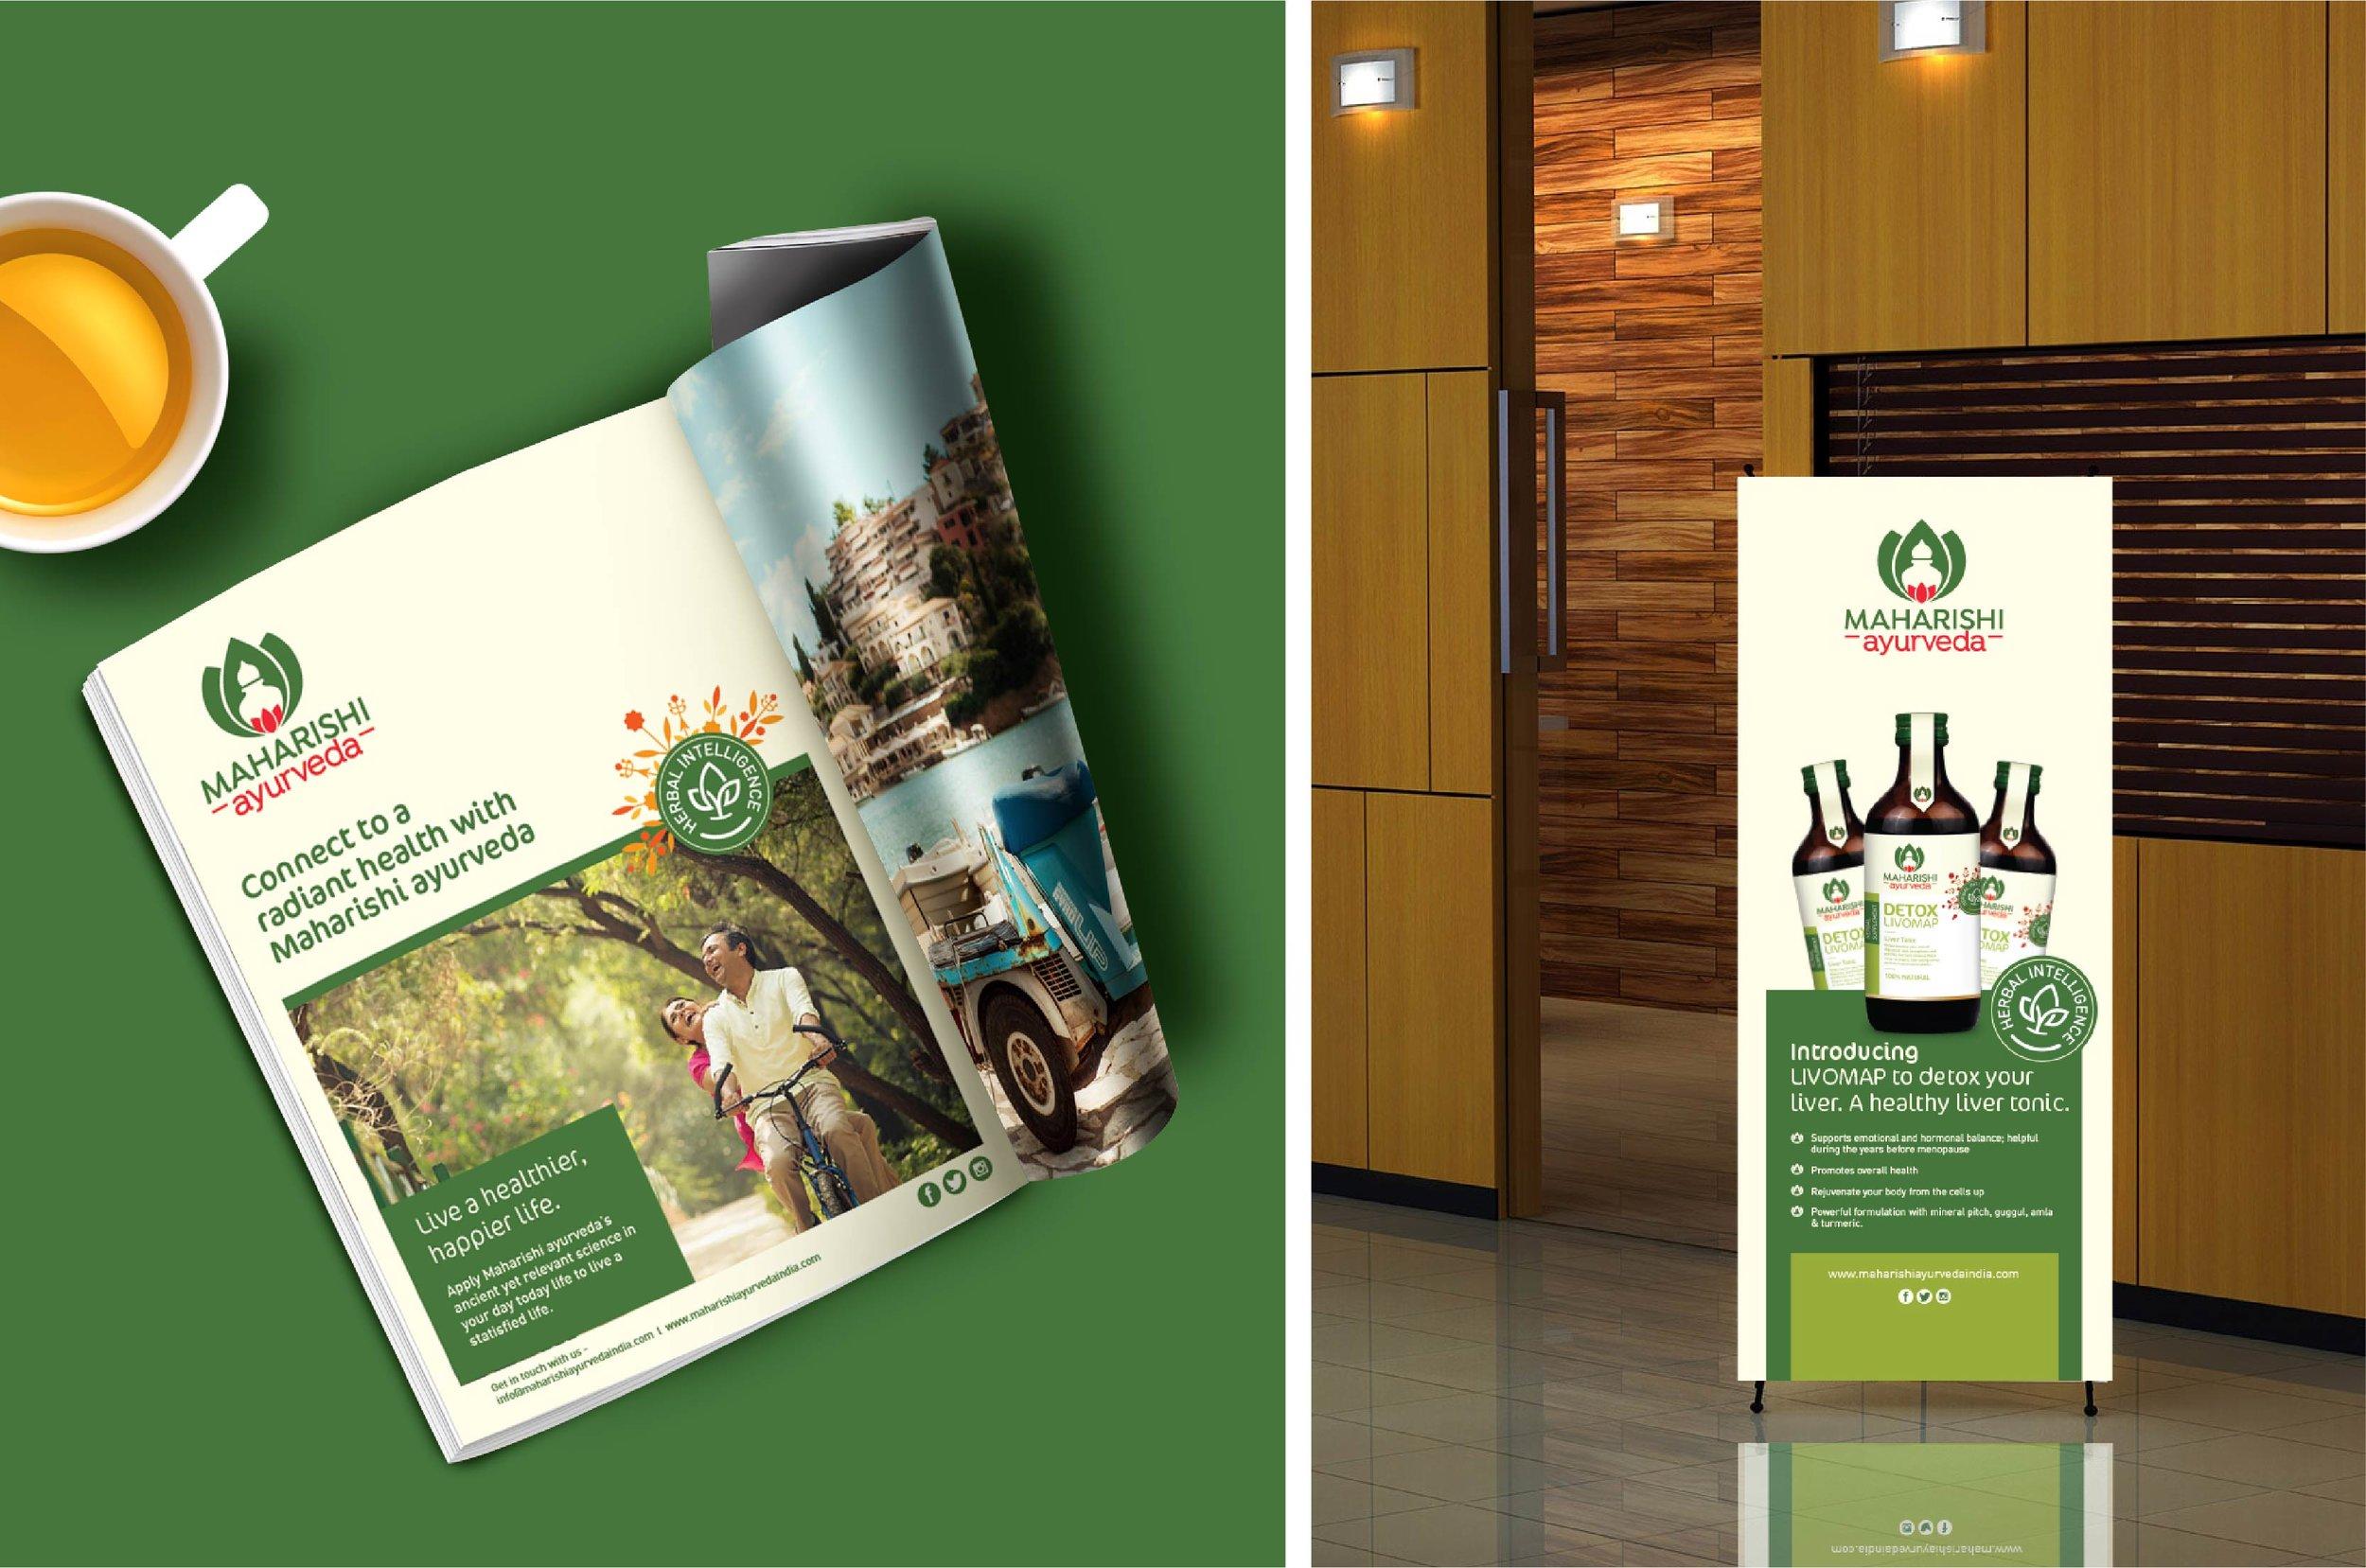 Maharshi Ayurveda_Branding Strategy, Communication Design_Elephant Design, Pune, Singapore_6.jpg